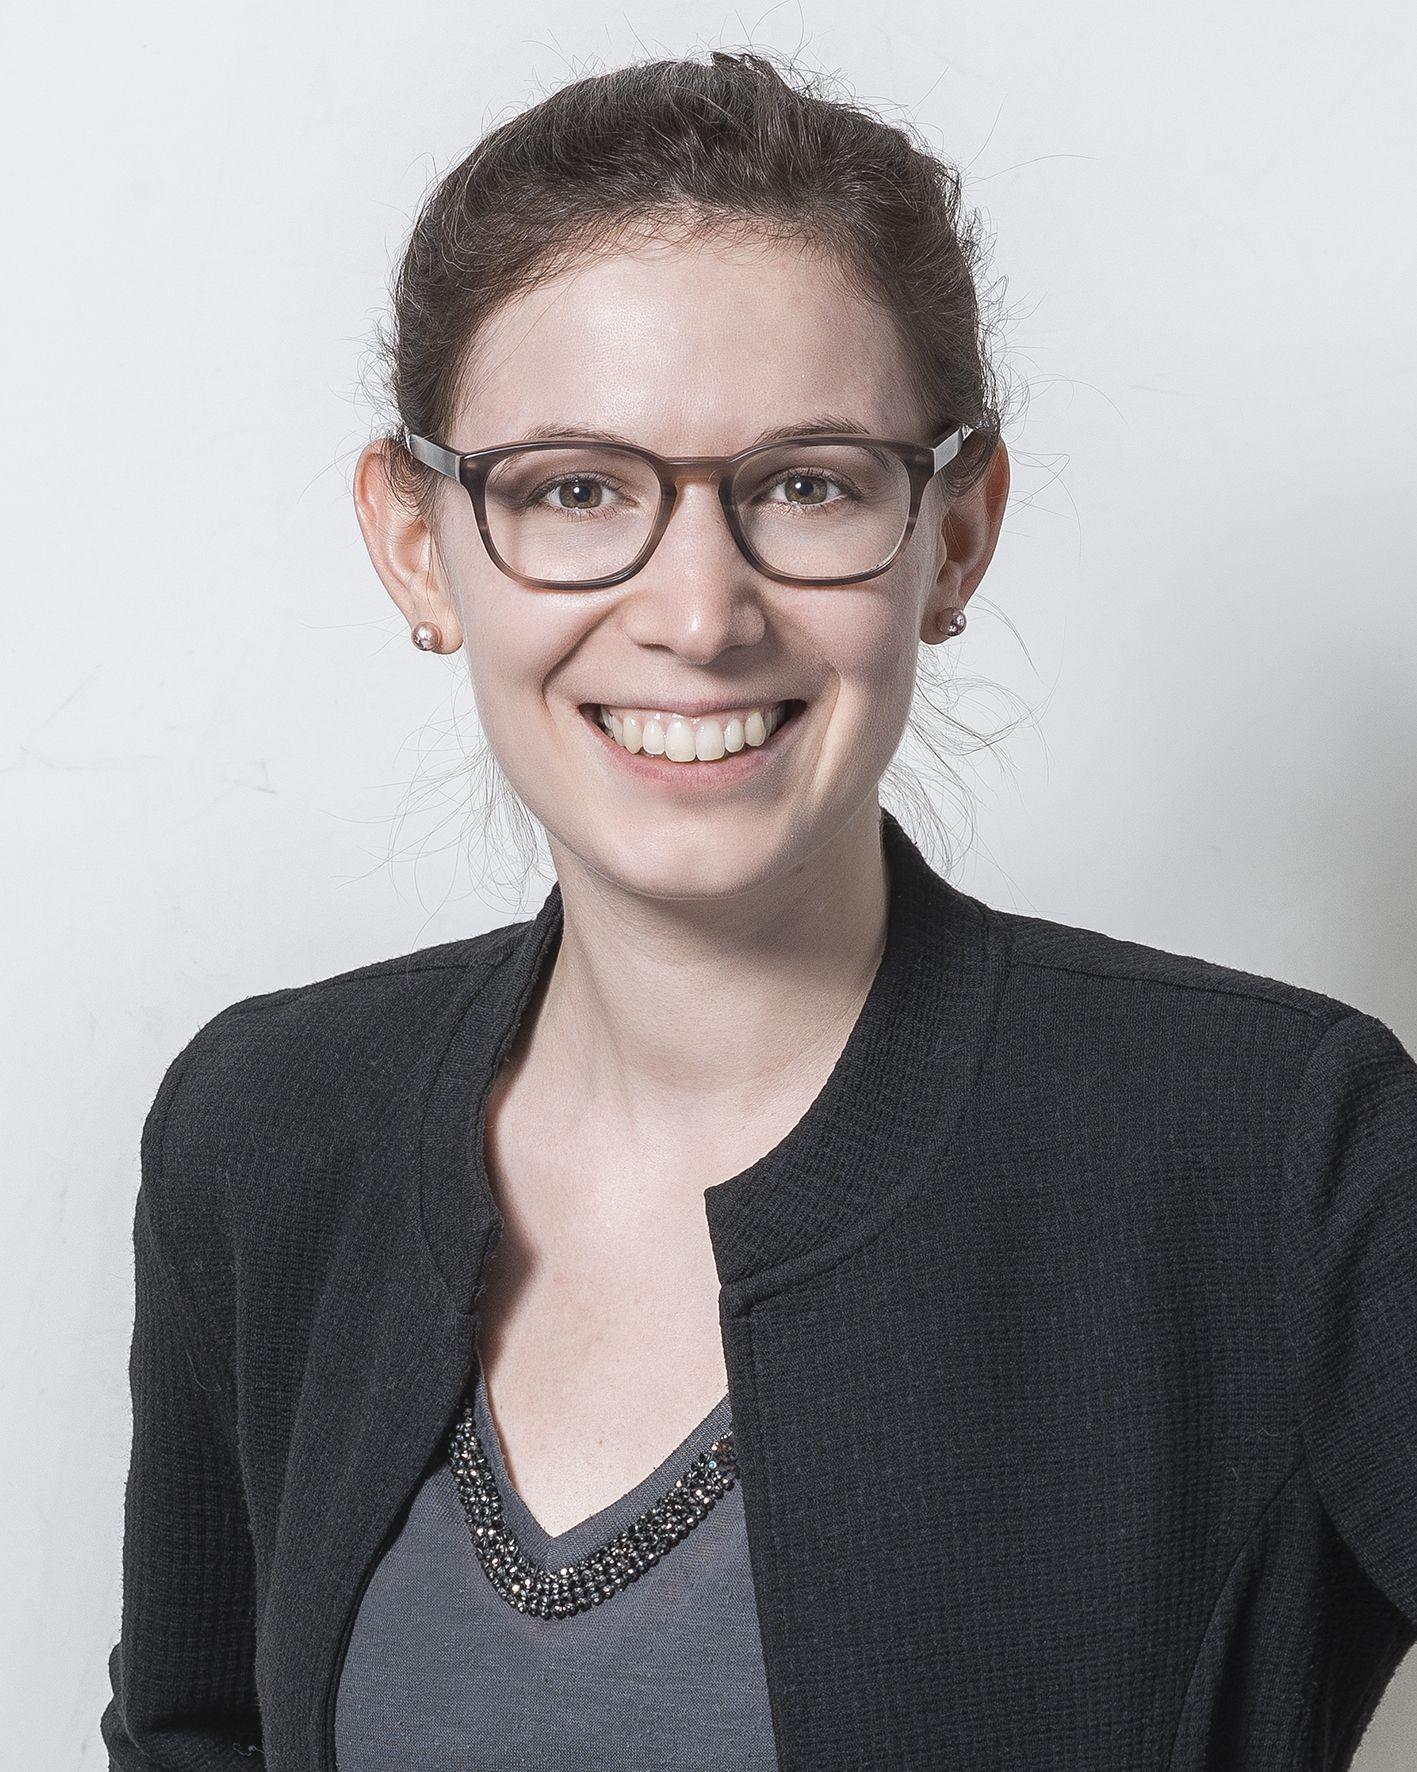 Sara Willi